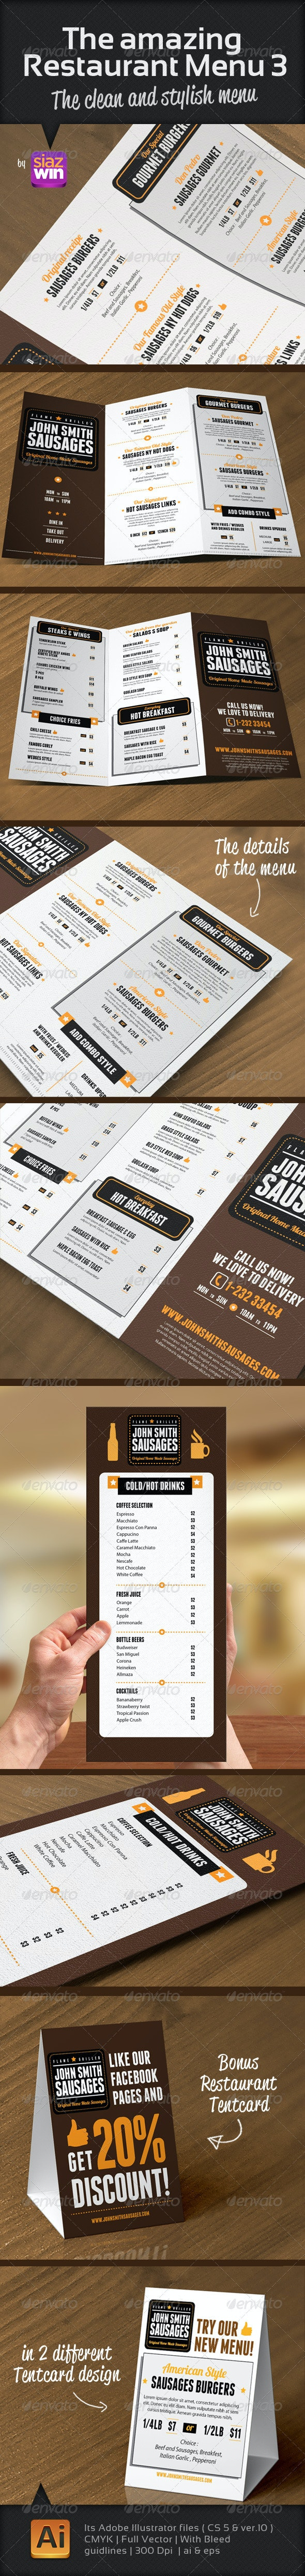 The Restaurant Menu 3 - Food Menus Print Templates